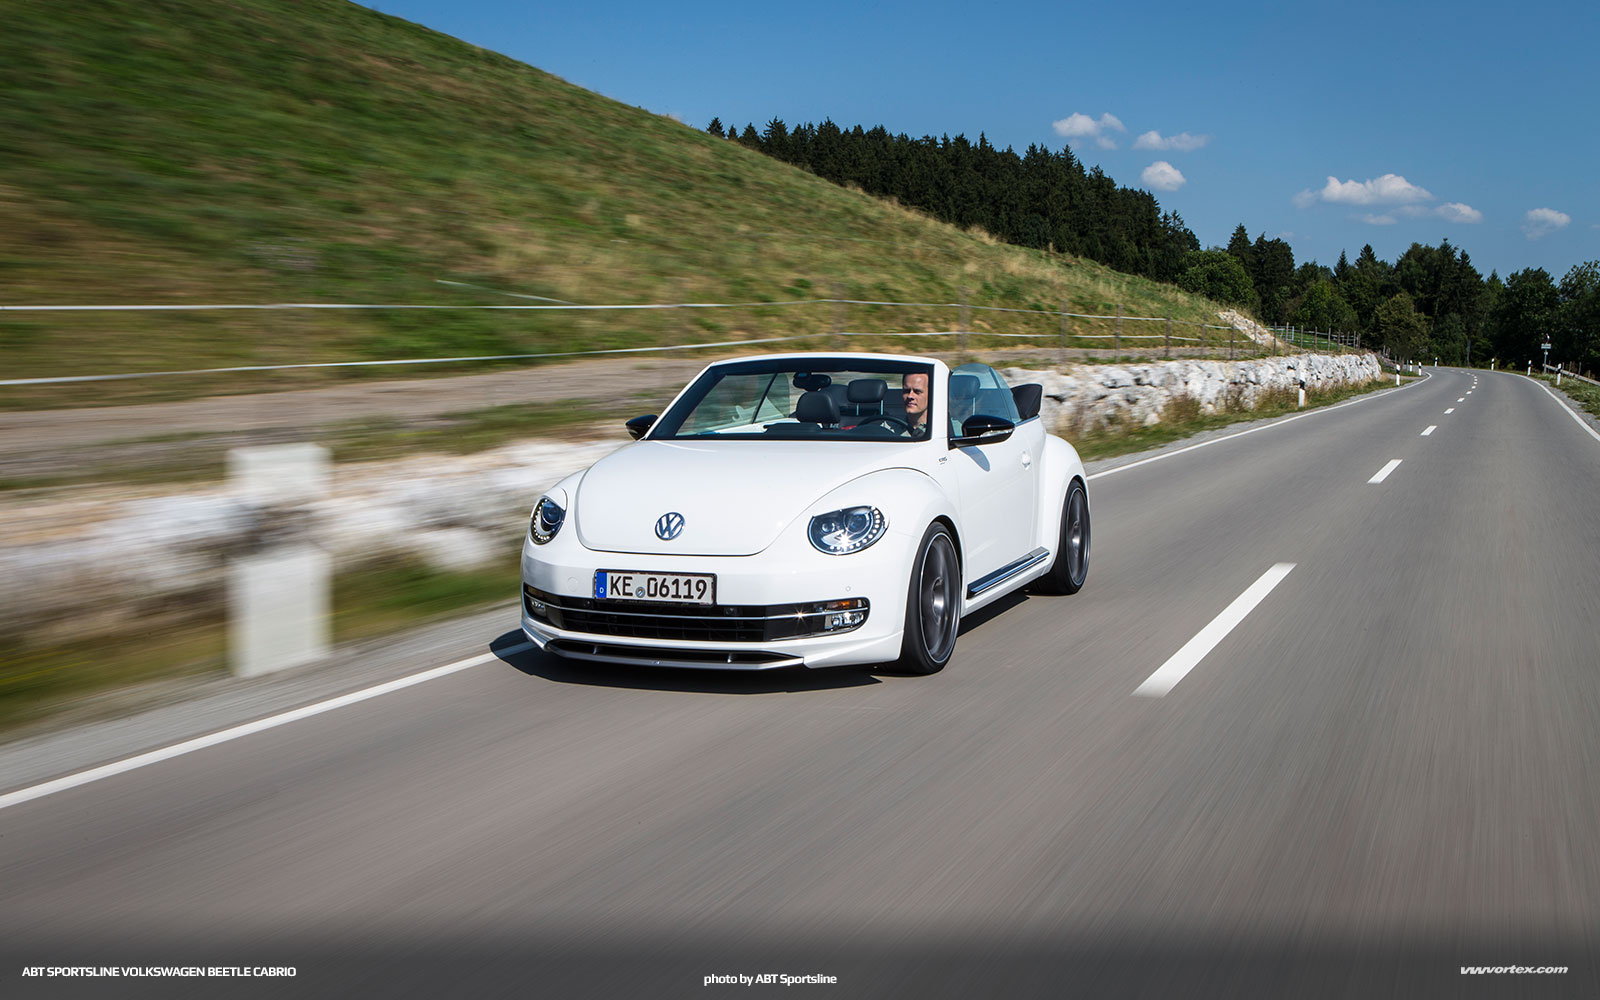 ABT-Sportsline-Volkswagen-Beetle-Cabrio-362